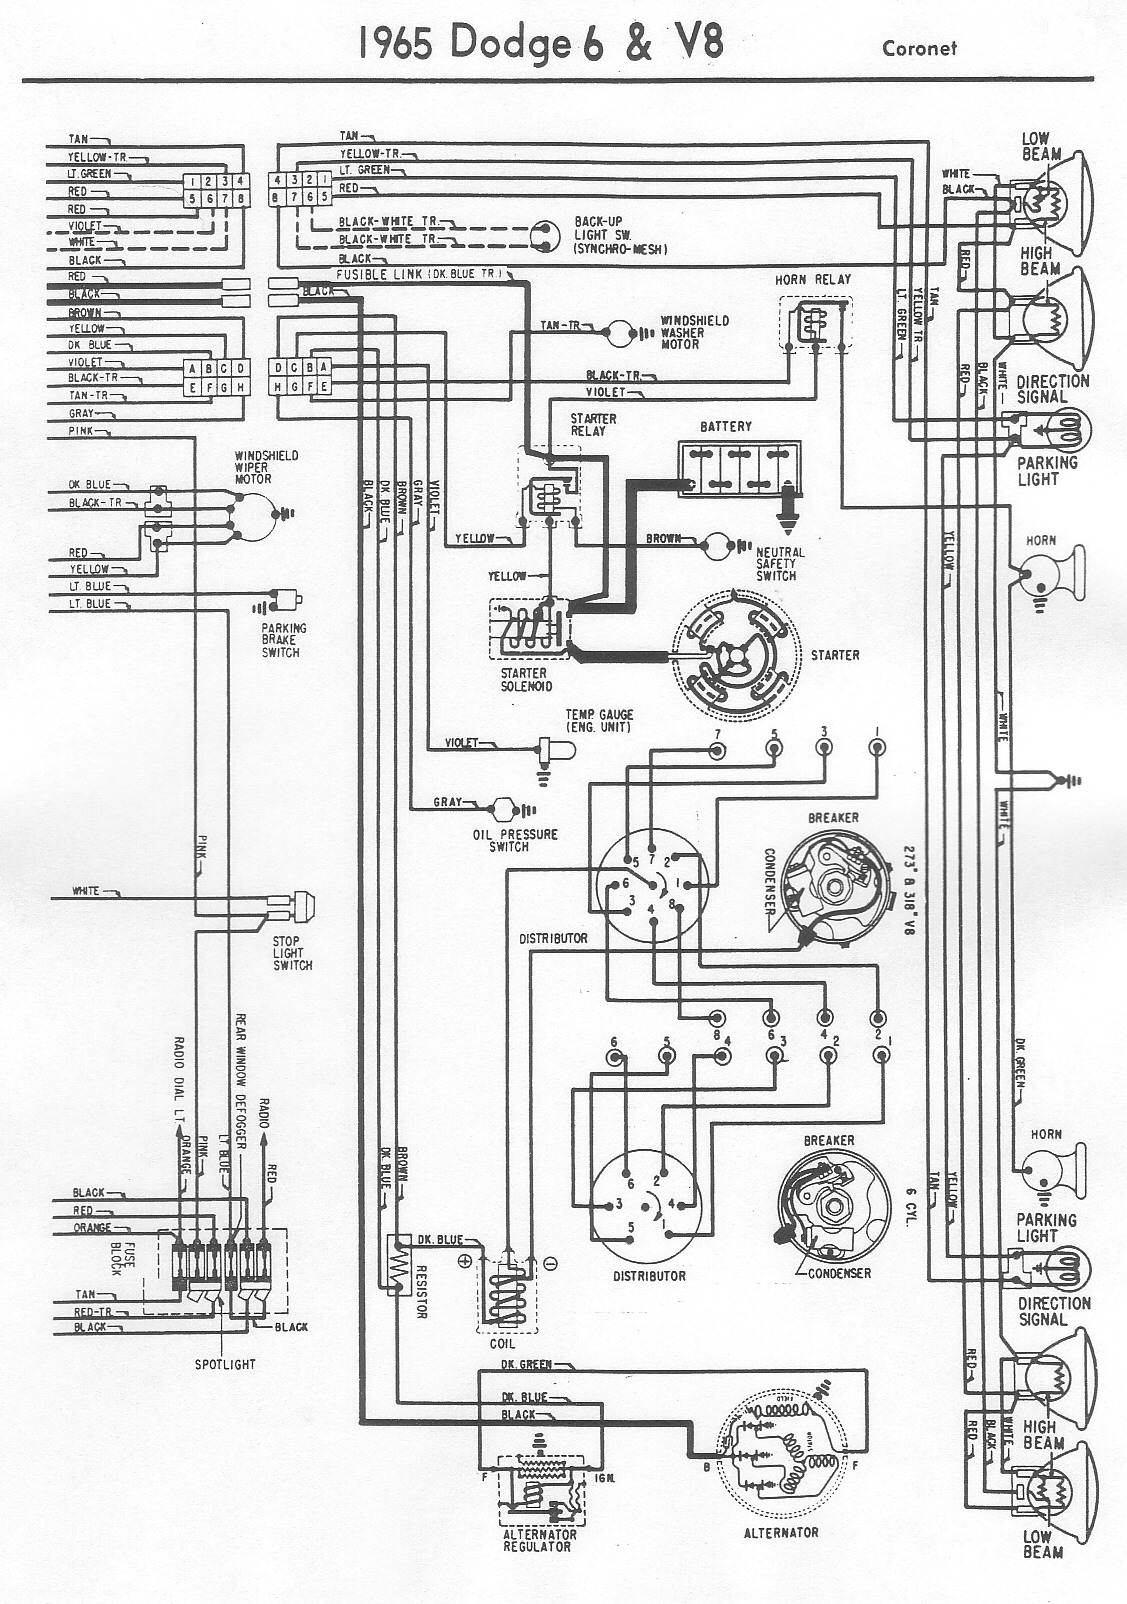 medium resolution of 1965 plymouth satellite wiring diagram trusted wiring diagram 1968 coronet wiring diagram 1968 satellite wiring diagram